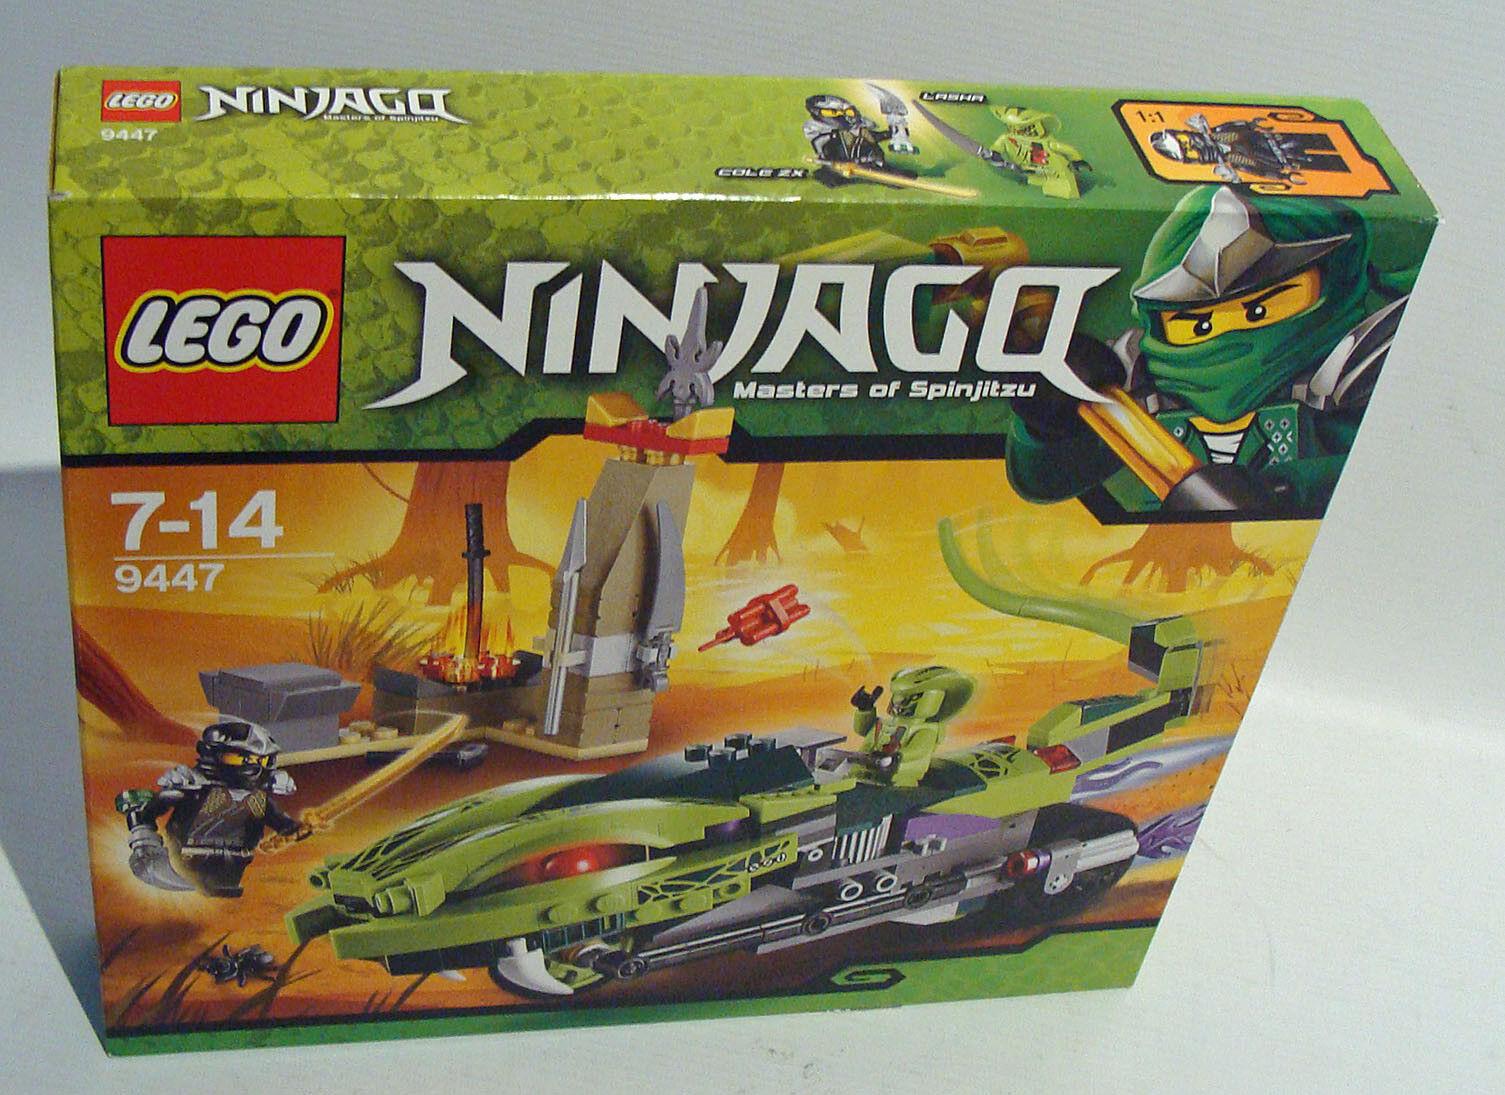 LEGO ® Ninjago 9447-lashas schlangenbike 250 pièces 7-14 ans-NEUF